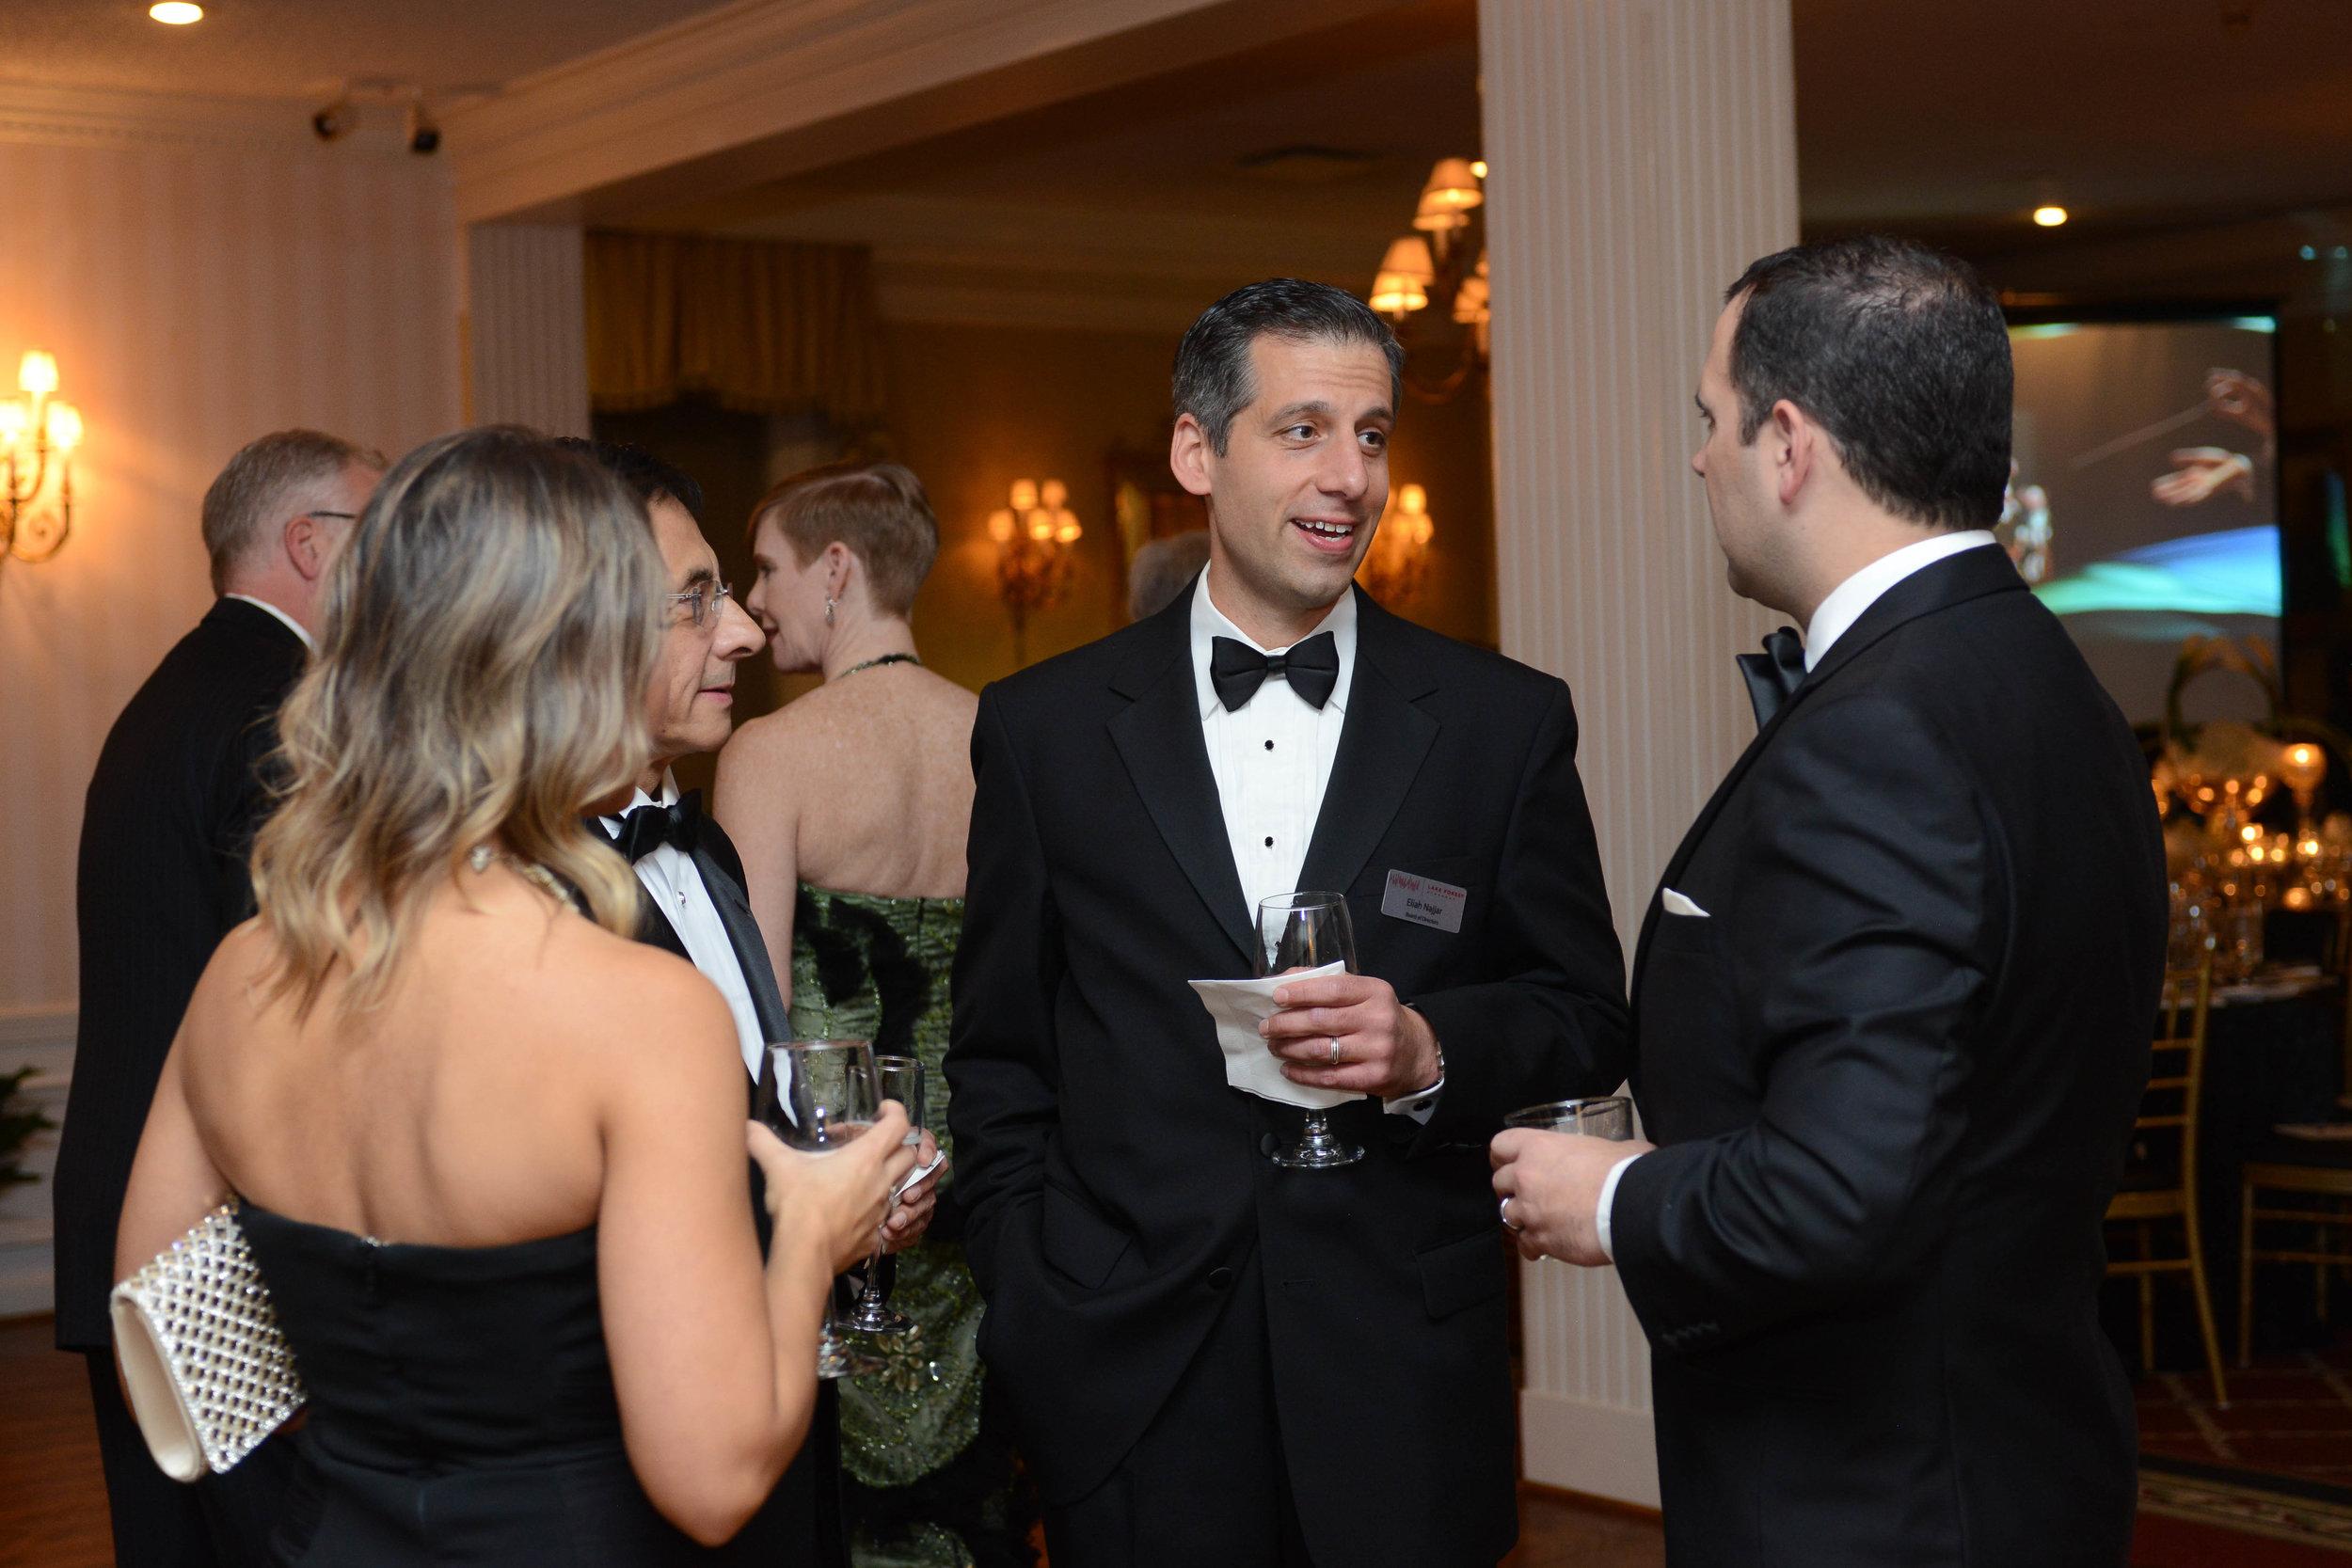 Board Members Hector Rasgado-Flores, Eliah Najjar, Josh Jackson, and his wife Racquel.